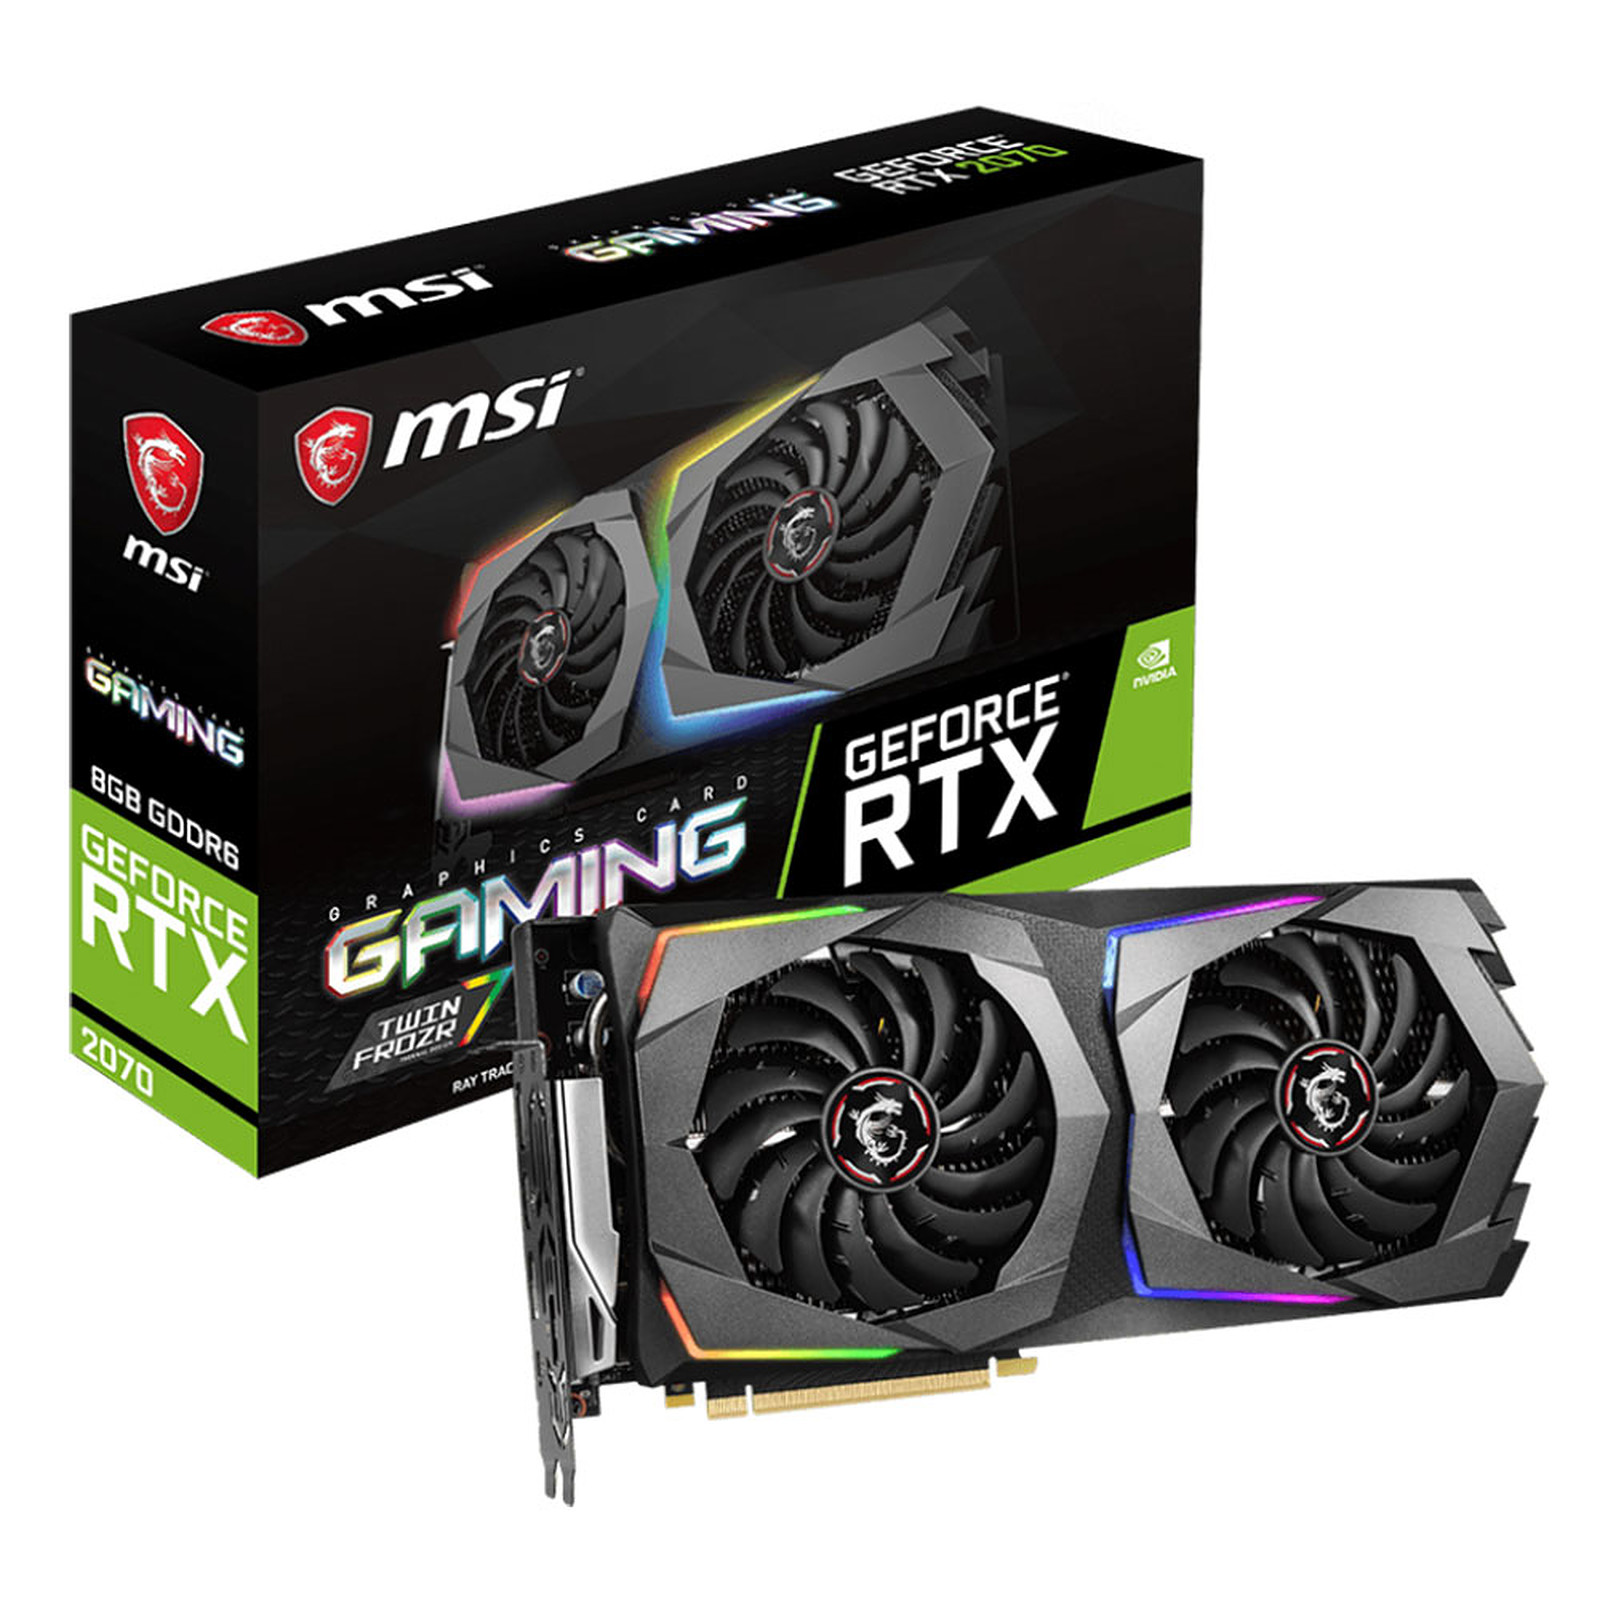 MSI GeForce RTX 2070 GAMING 8G